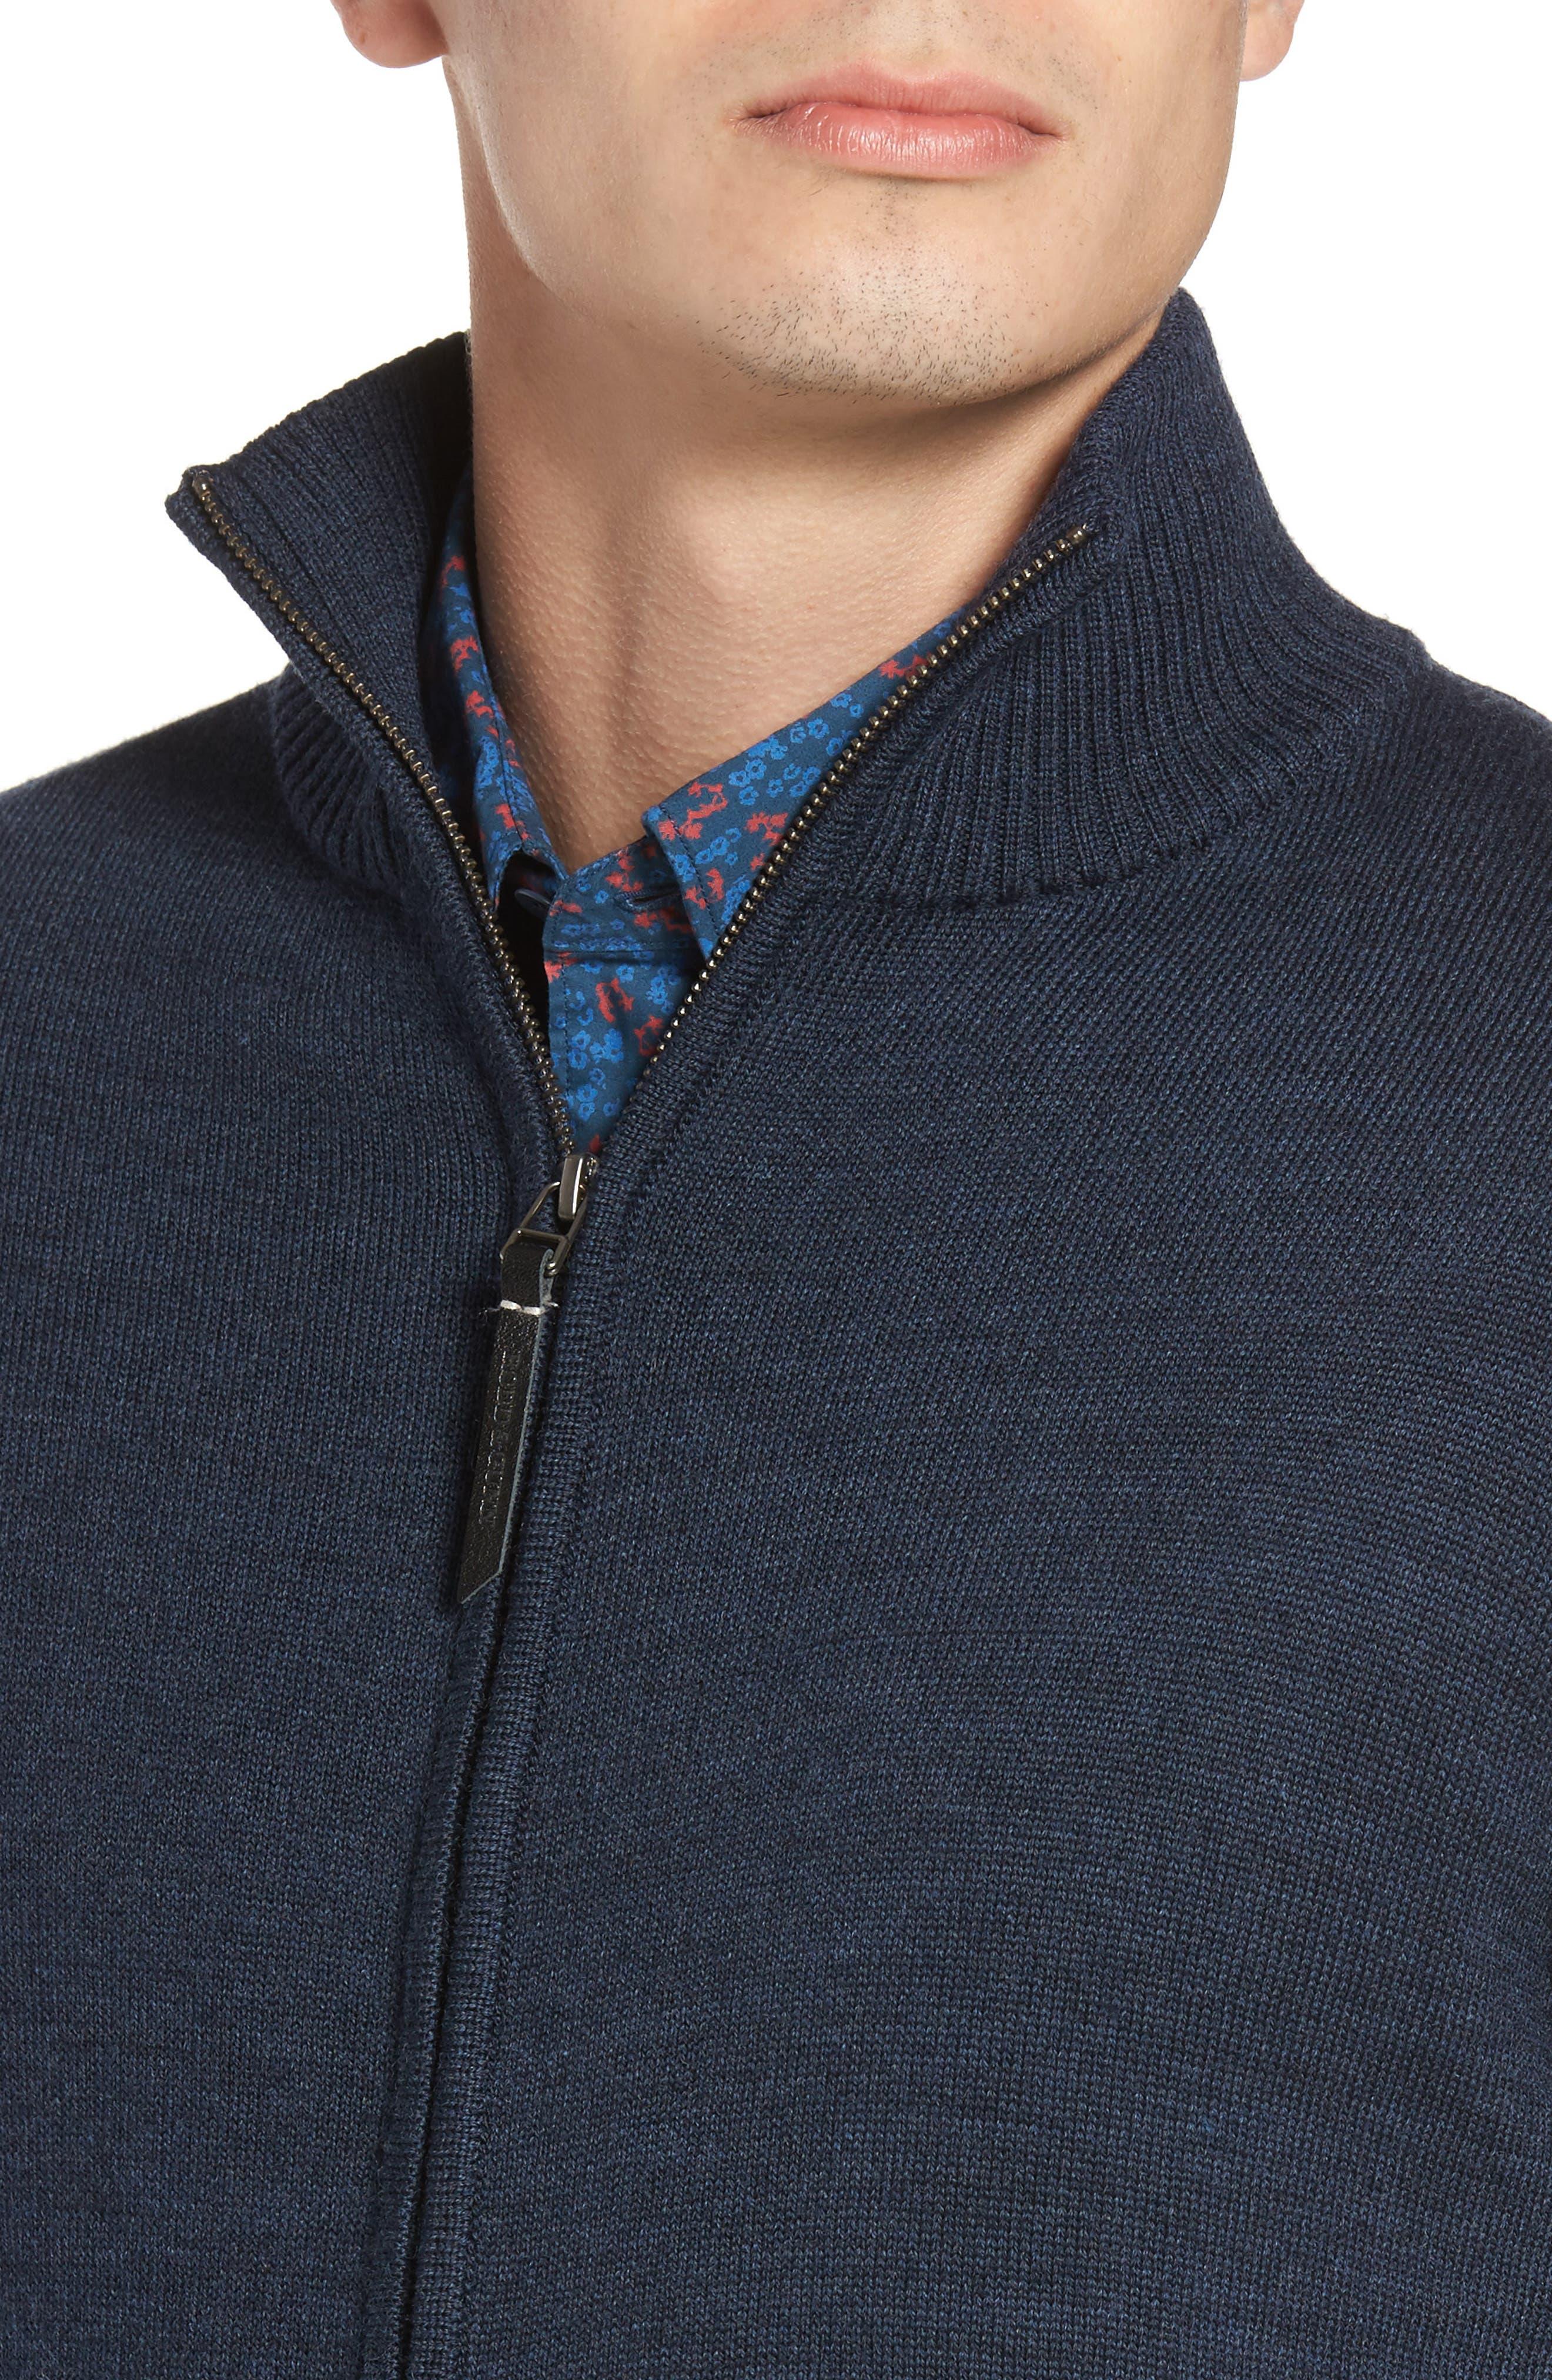 Roaring Meg Zip Wool Sweater,                             Alternate thumbnail 4, color,                             401